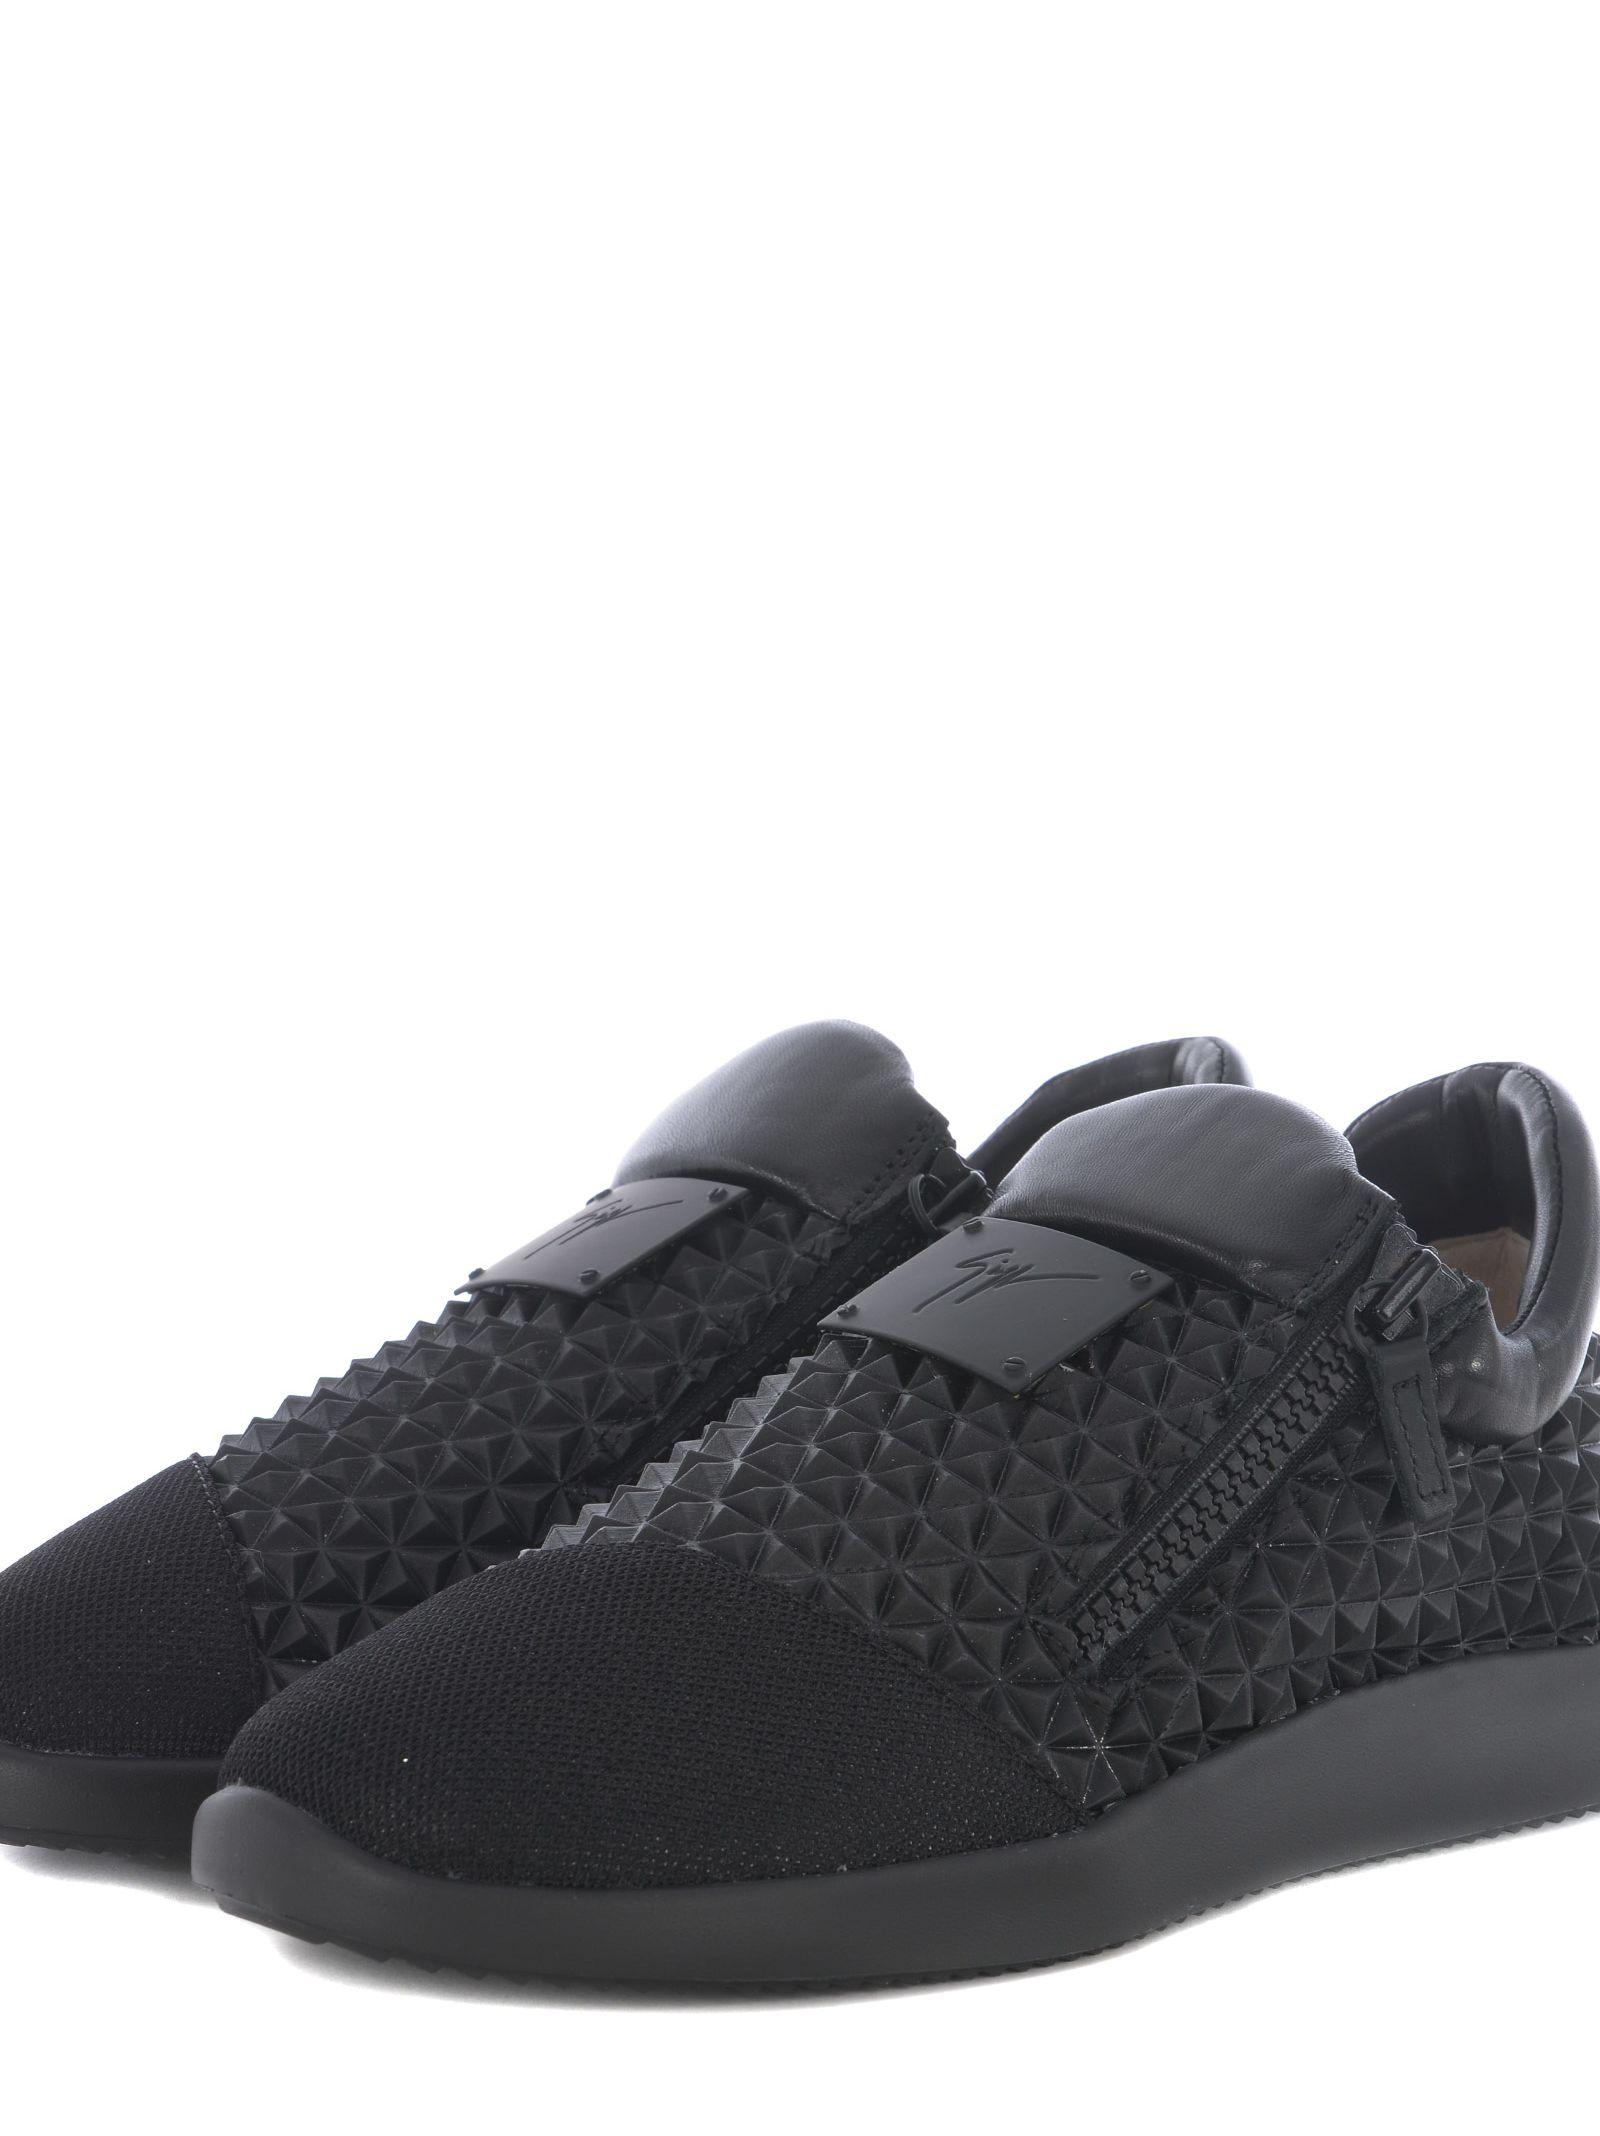 bb833e2f0d2c1 Atlassian CrowdID - Zanotti Baby Shoes Ecco Ladies Shoes On Sale ...